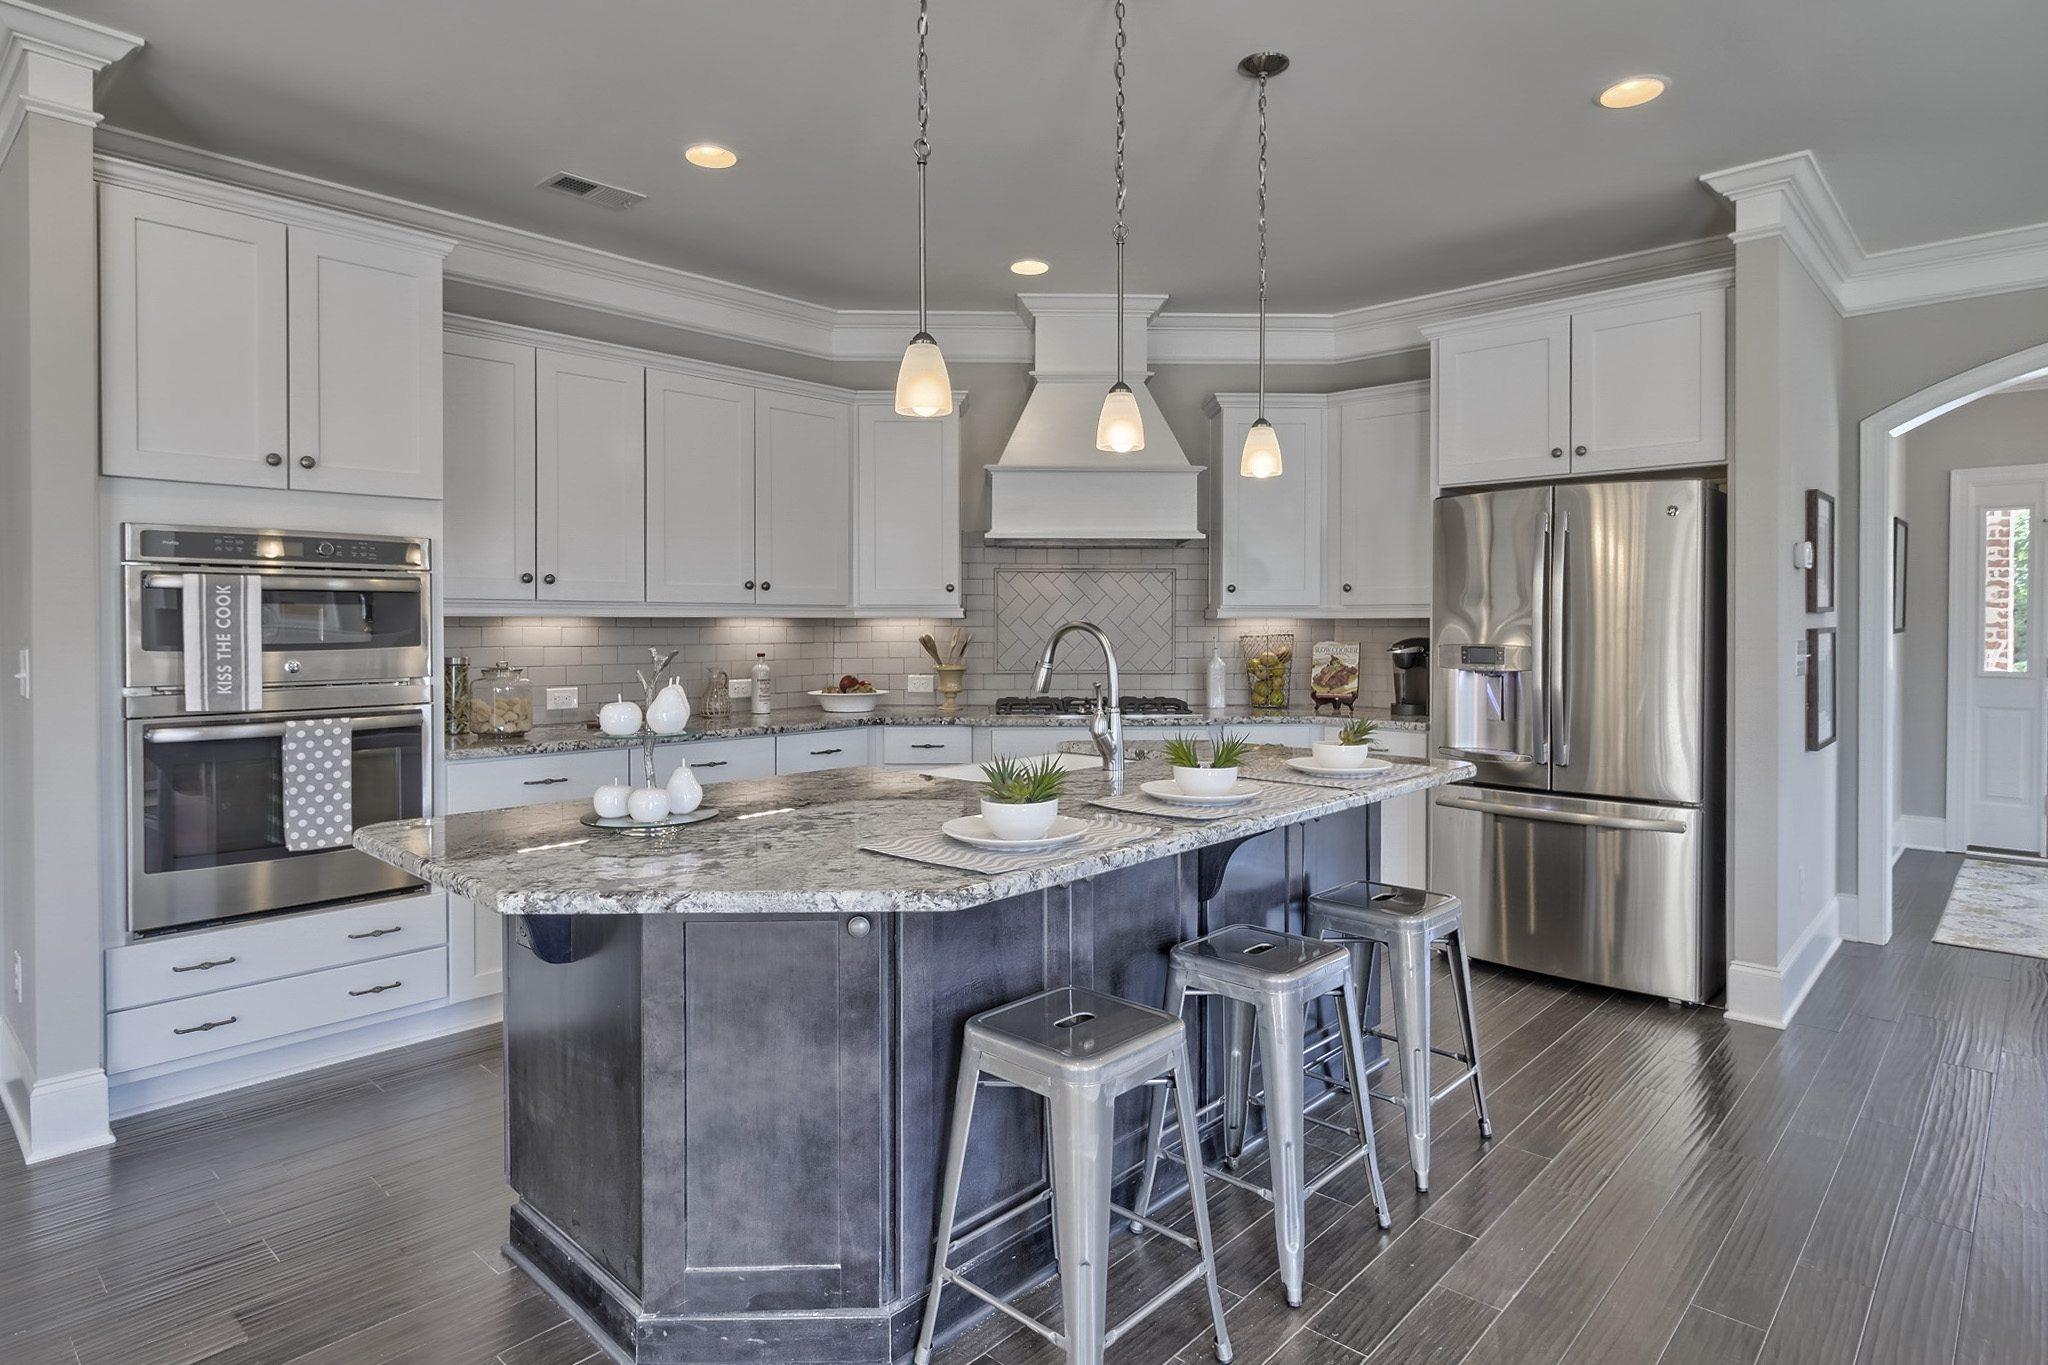 Epcon-interior-kitchen-option-floor-plan